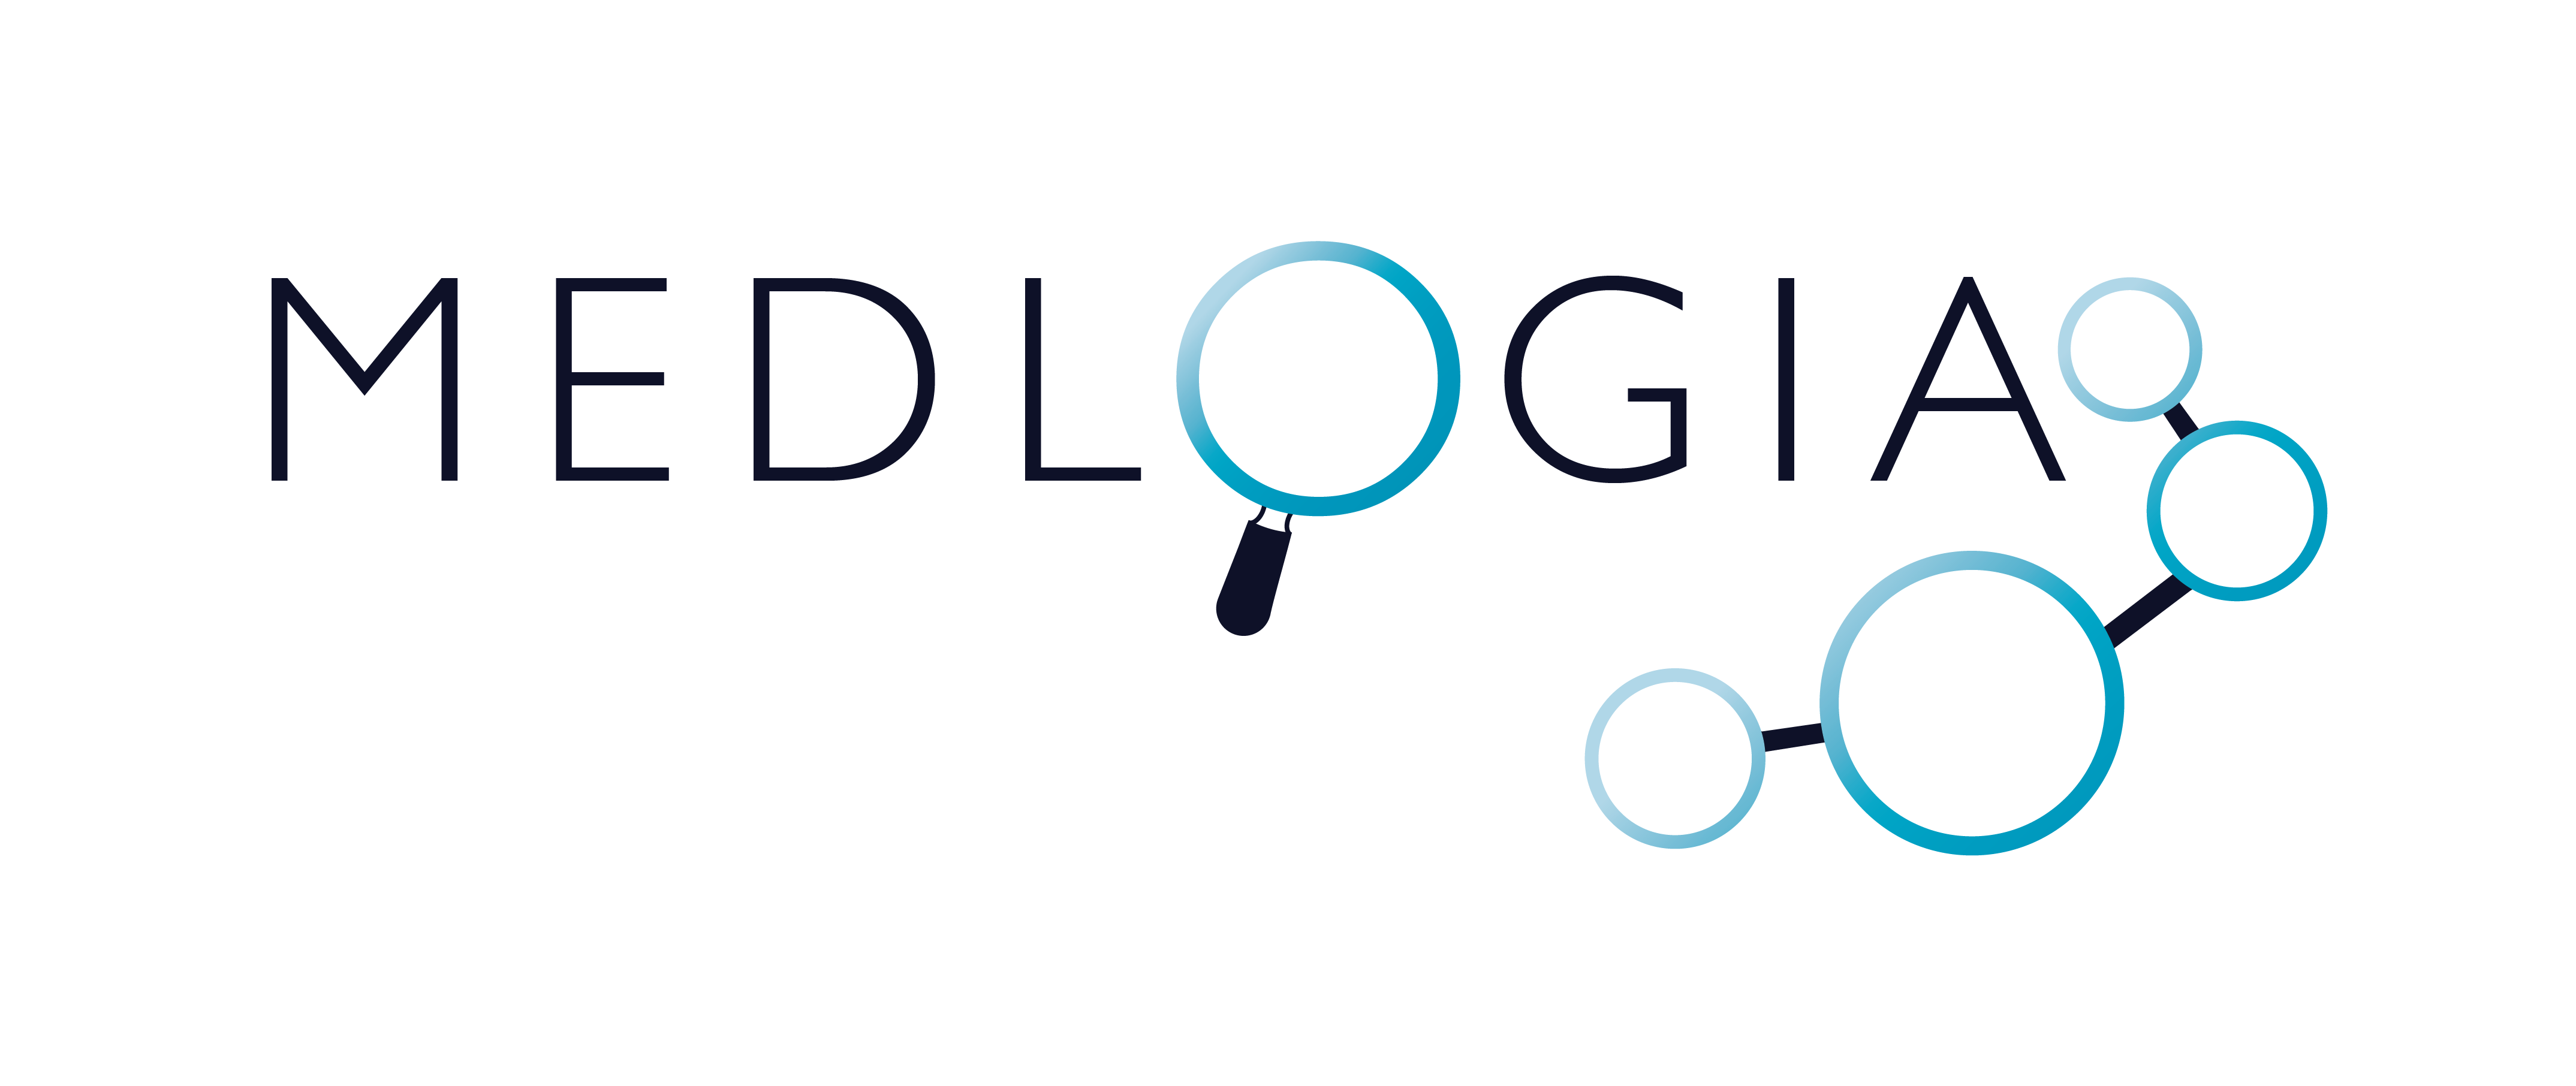 Medlogia Logo